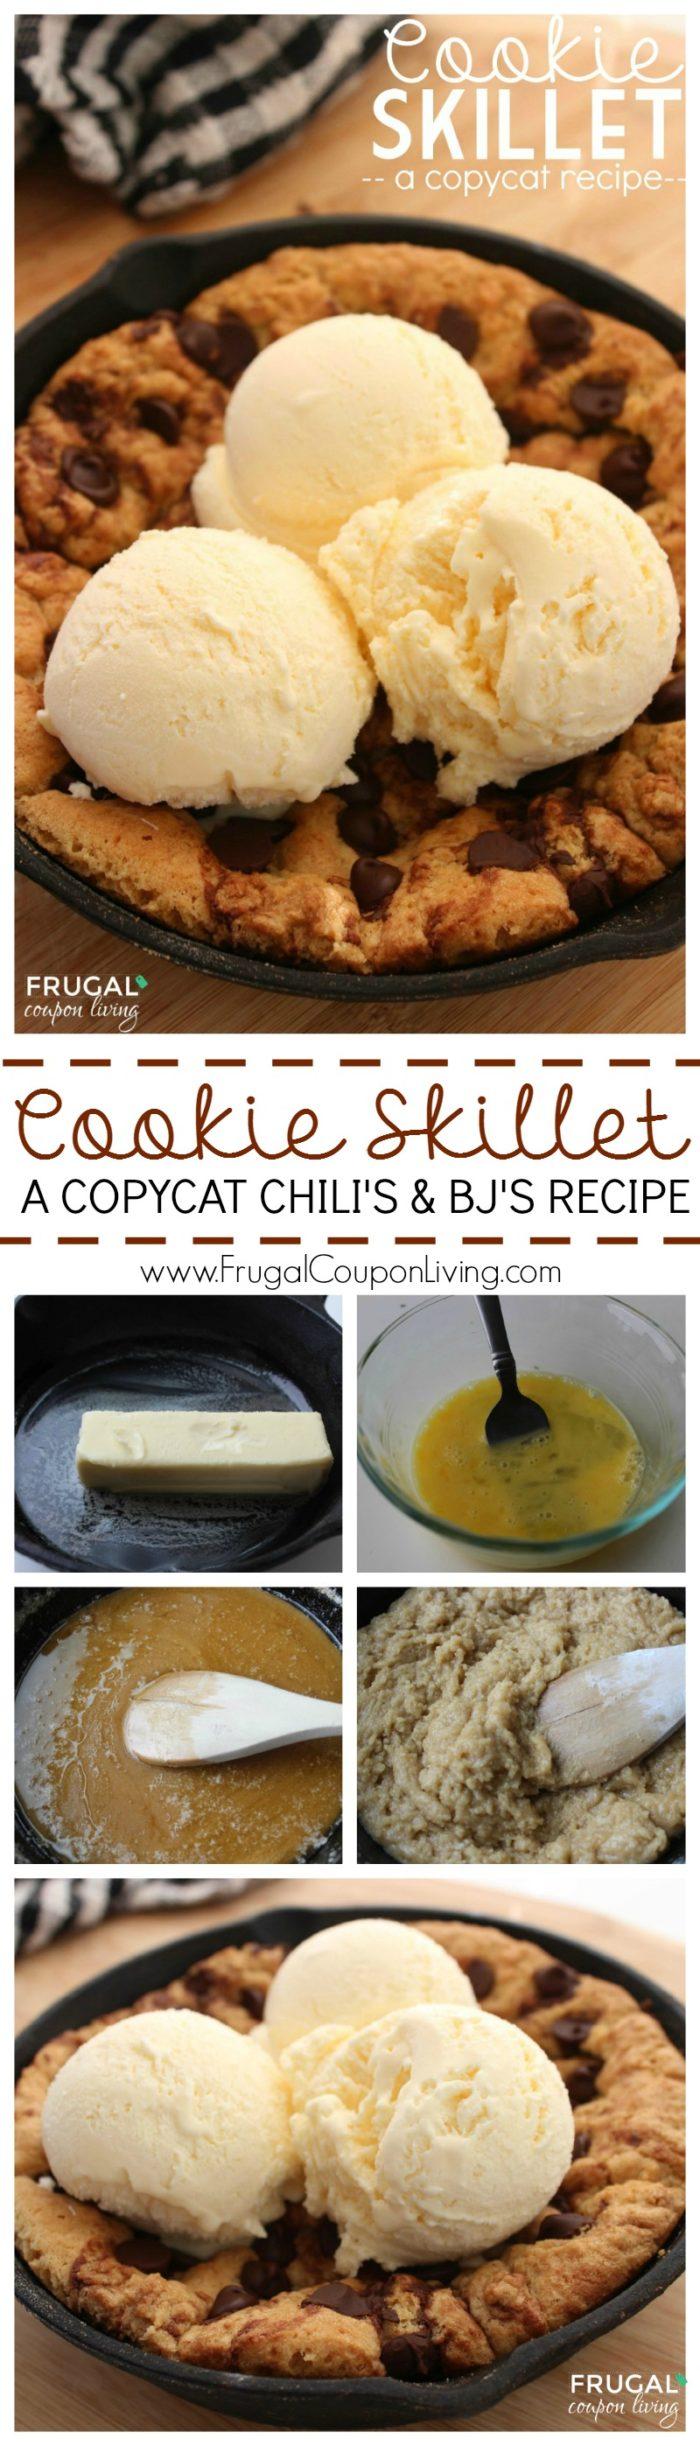 Copycat Chili's Cookie Skillet - AKA Pizookie